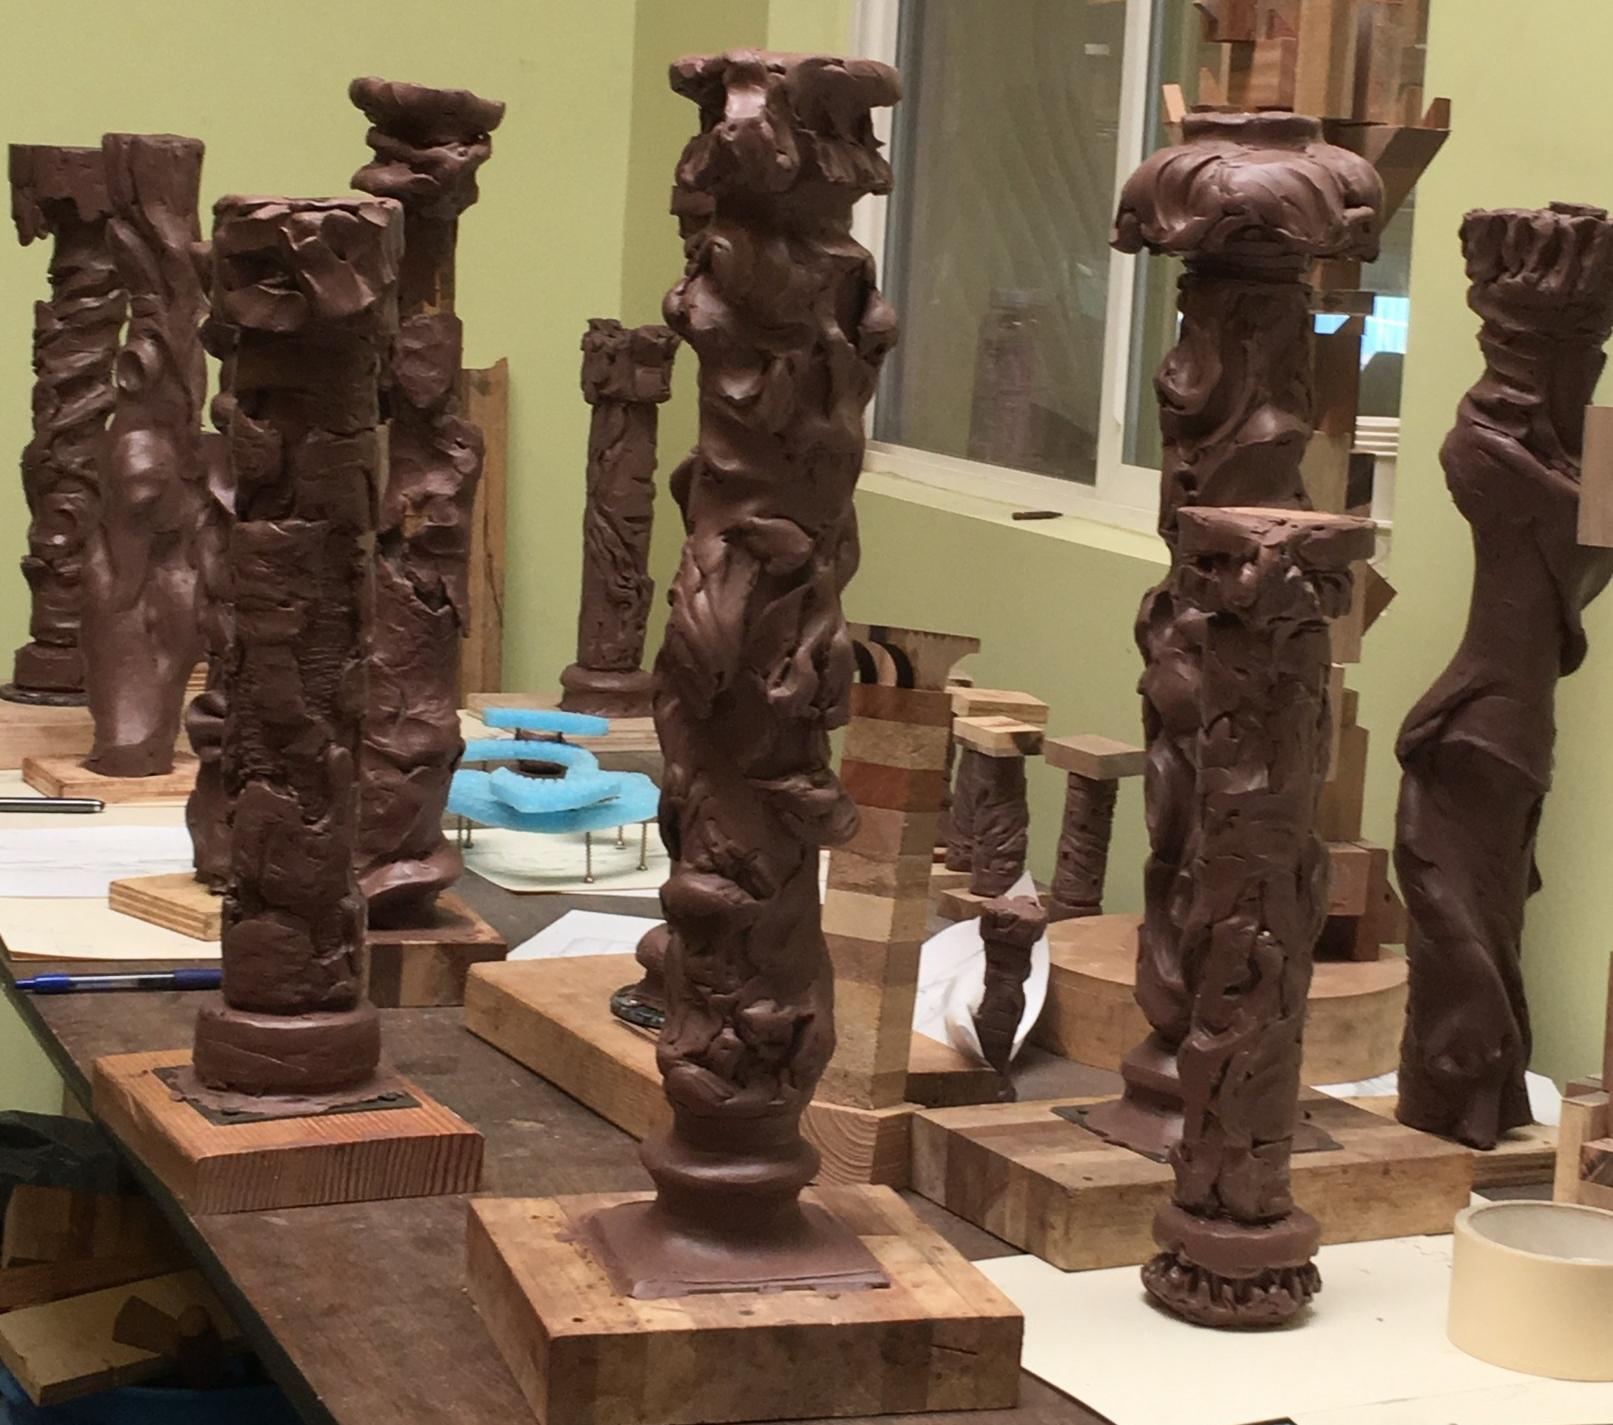 more clay maquettes by grigoyr